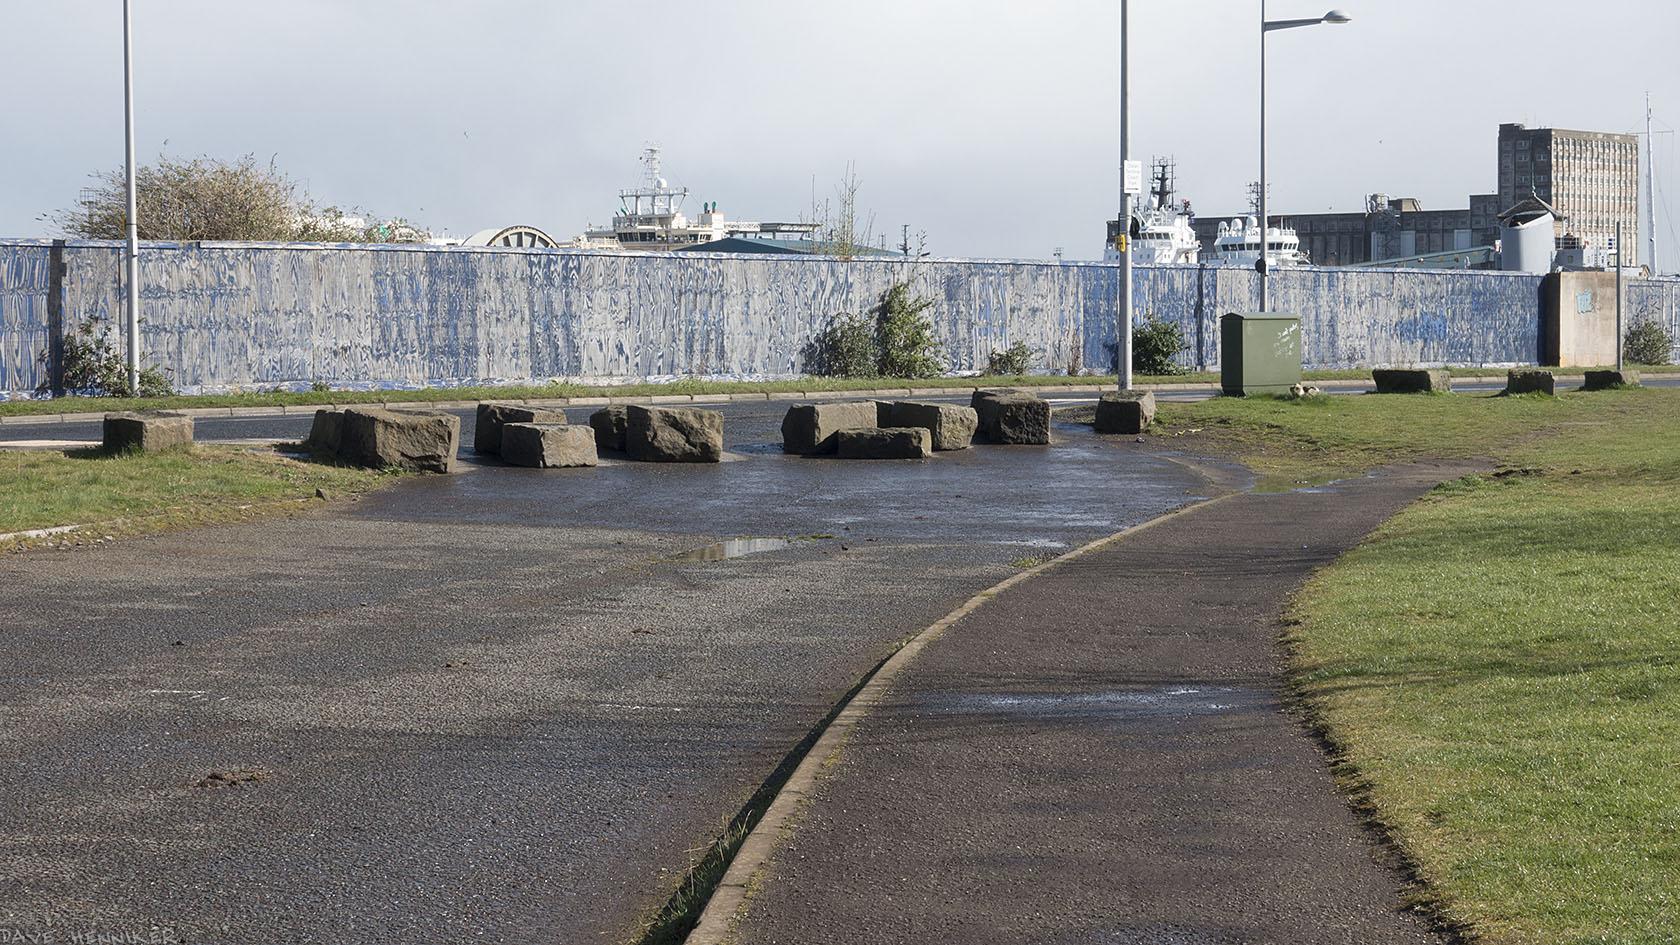 Ocean Drive ahead behind the stone blocks.